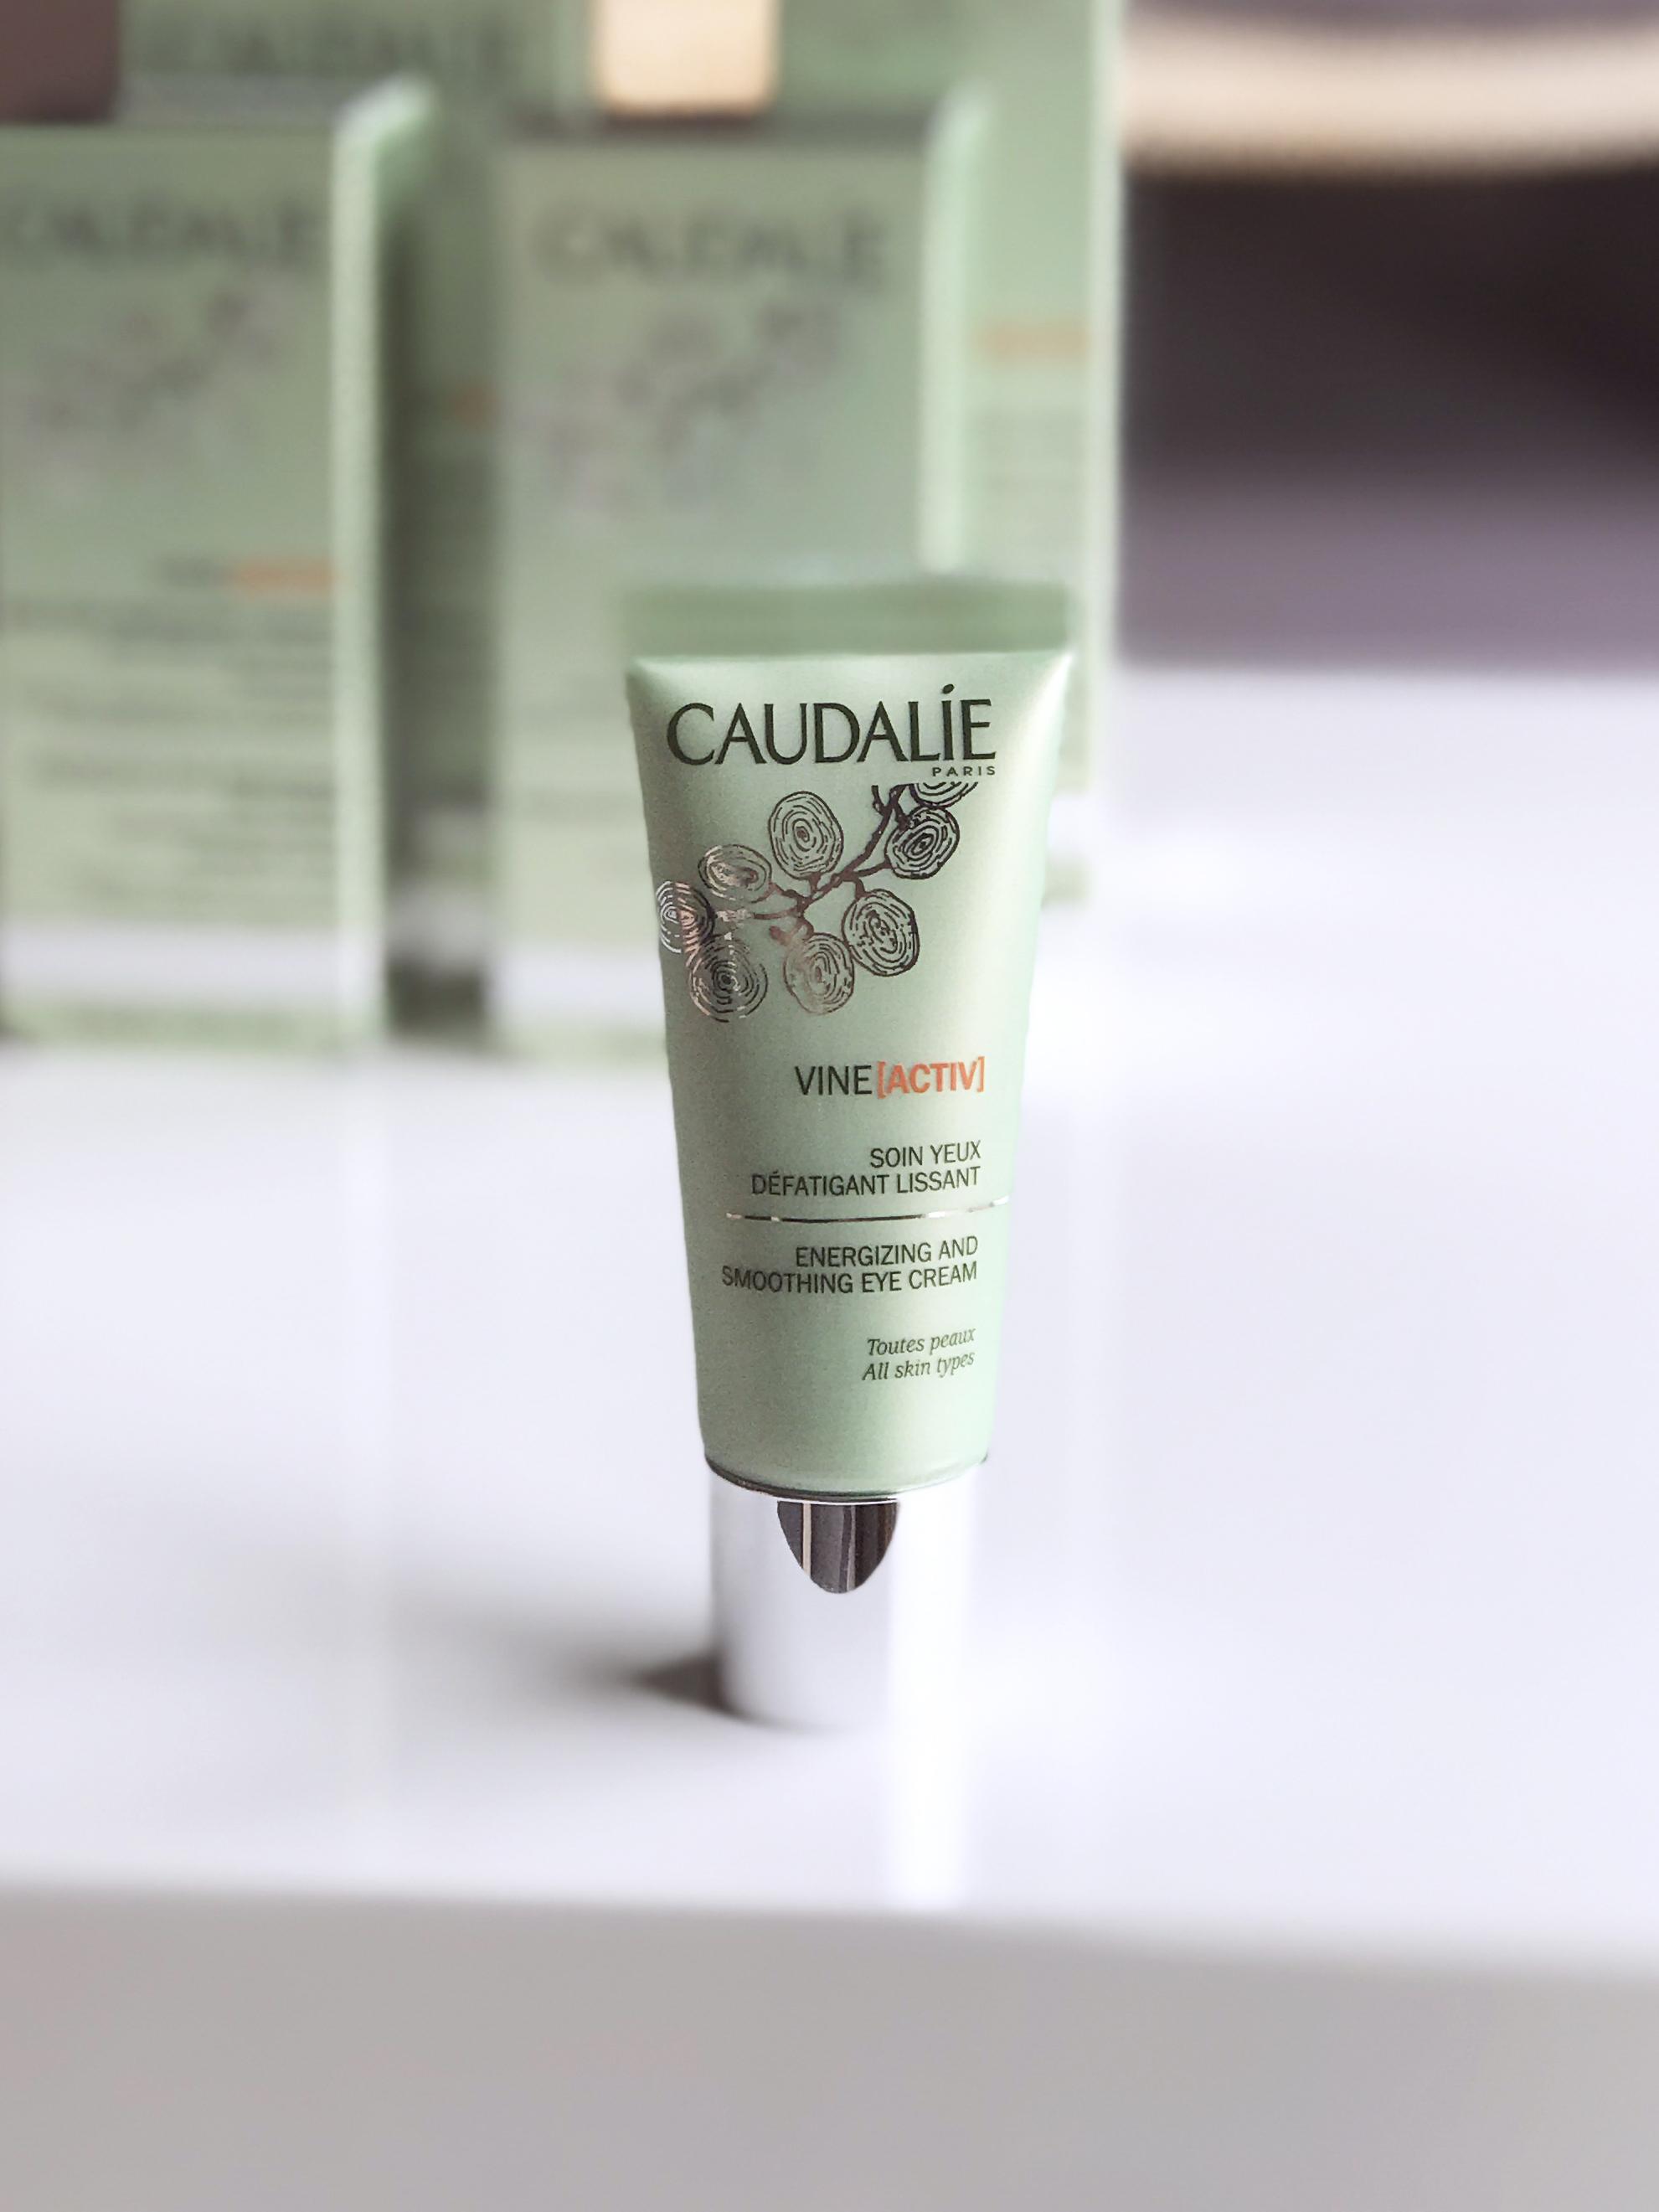 Caudalie Energising and Smoothing Eye Cream